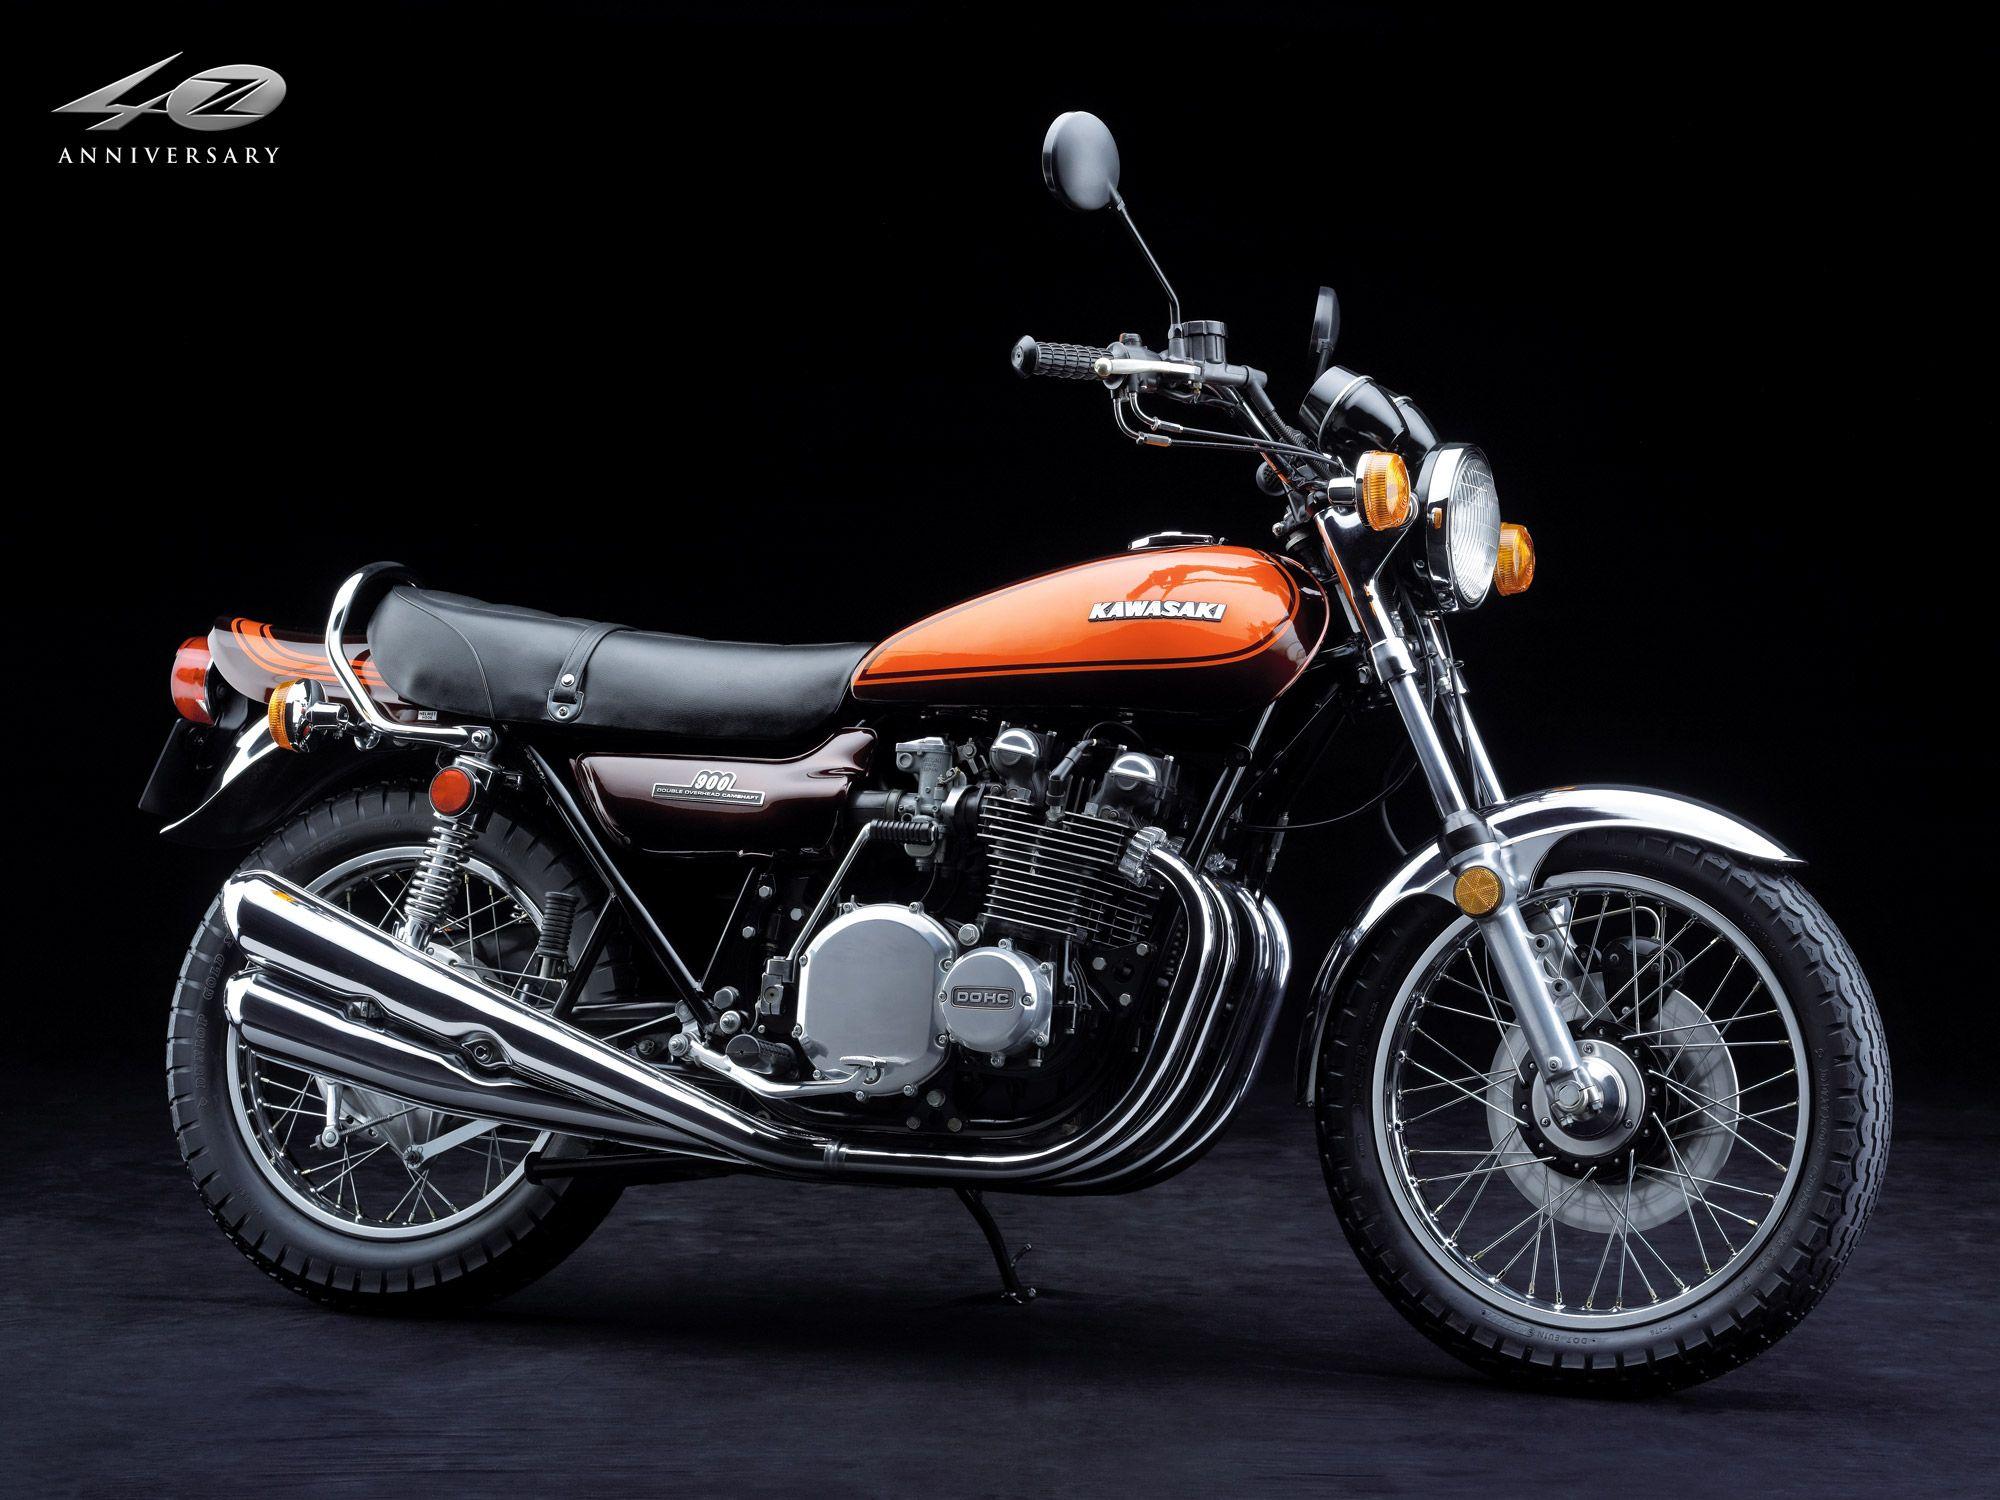 Pin De Bob Sincick Em Norimono Motocicletas Kawasaki Motos Yamaha Motos Classicas